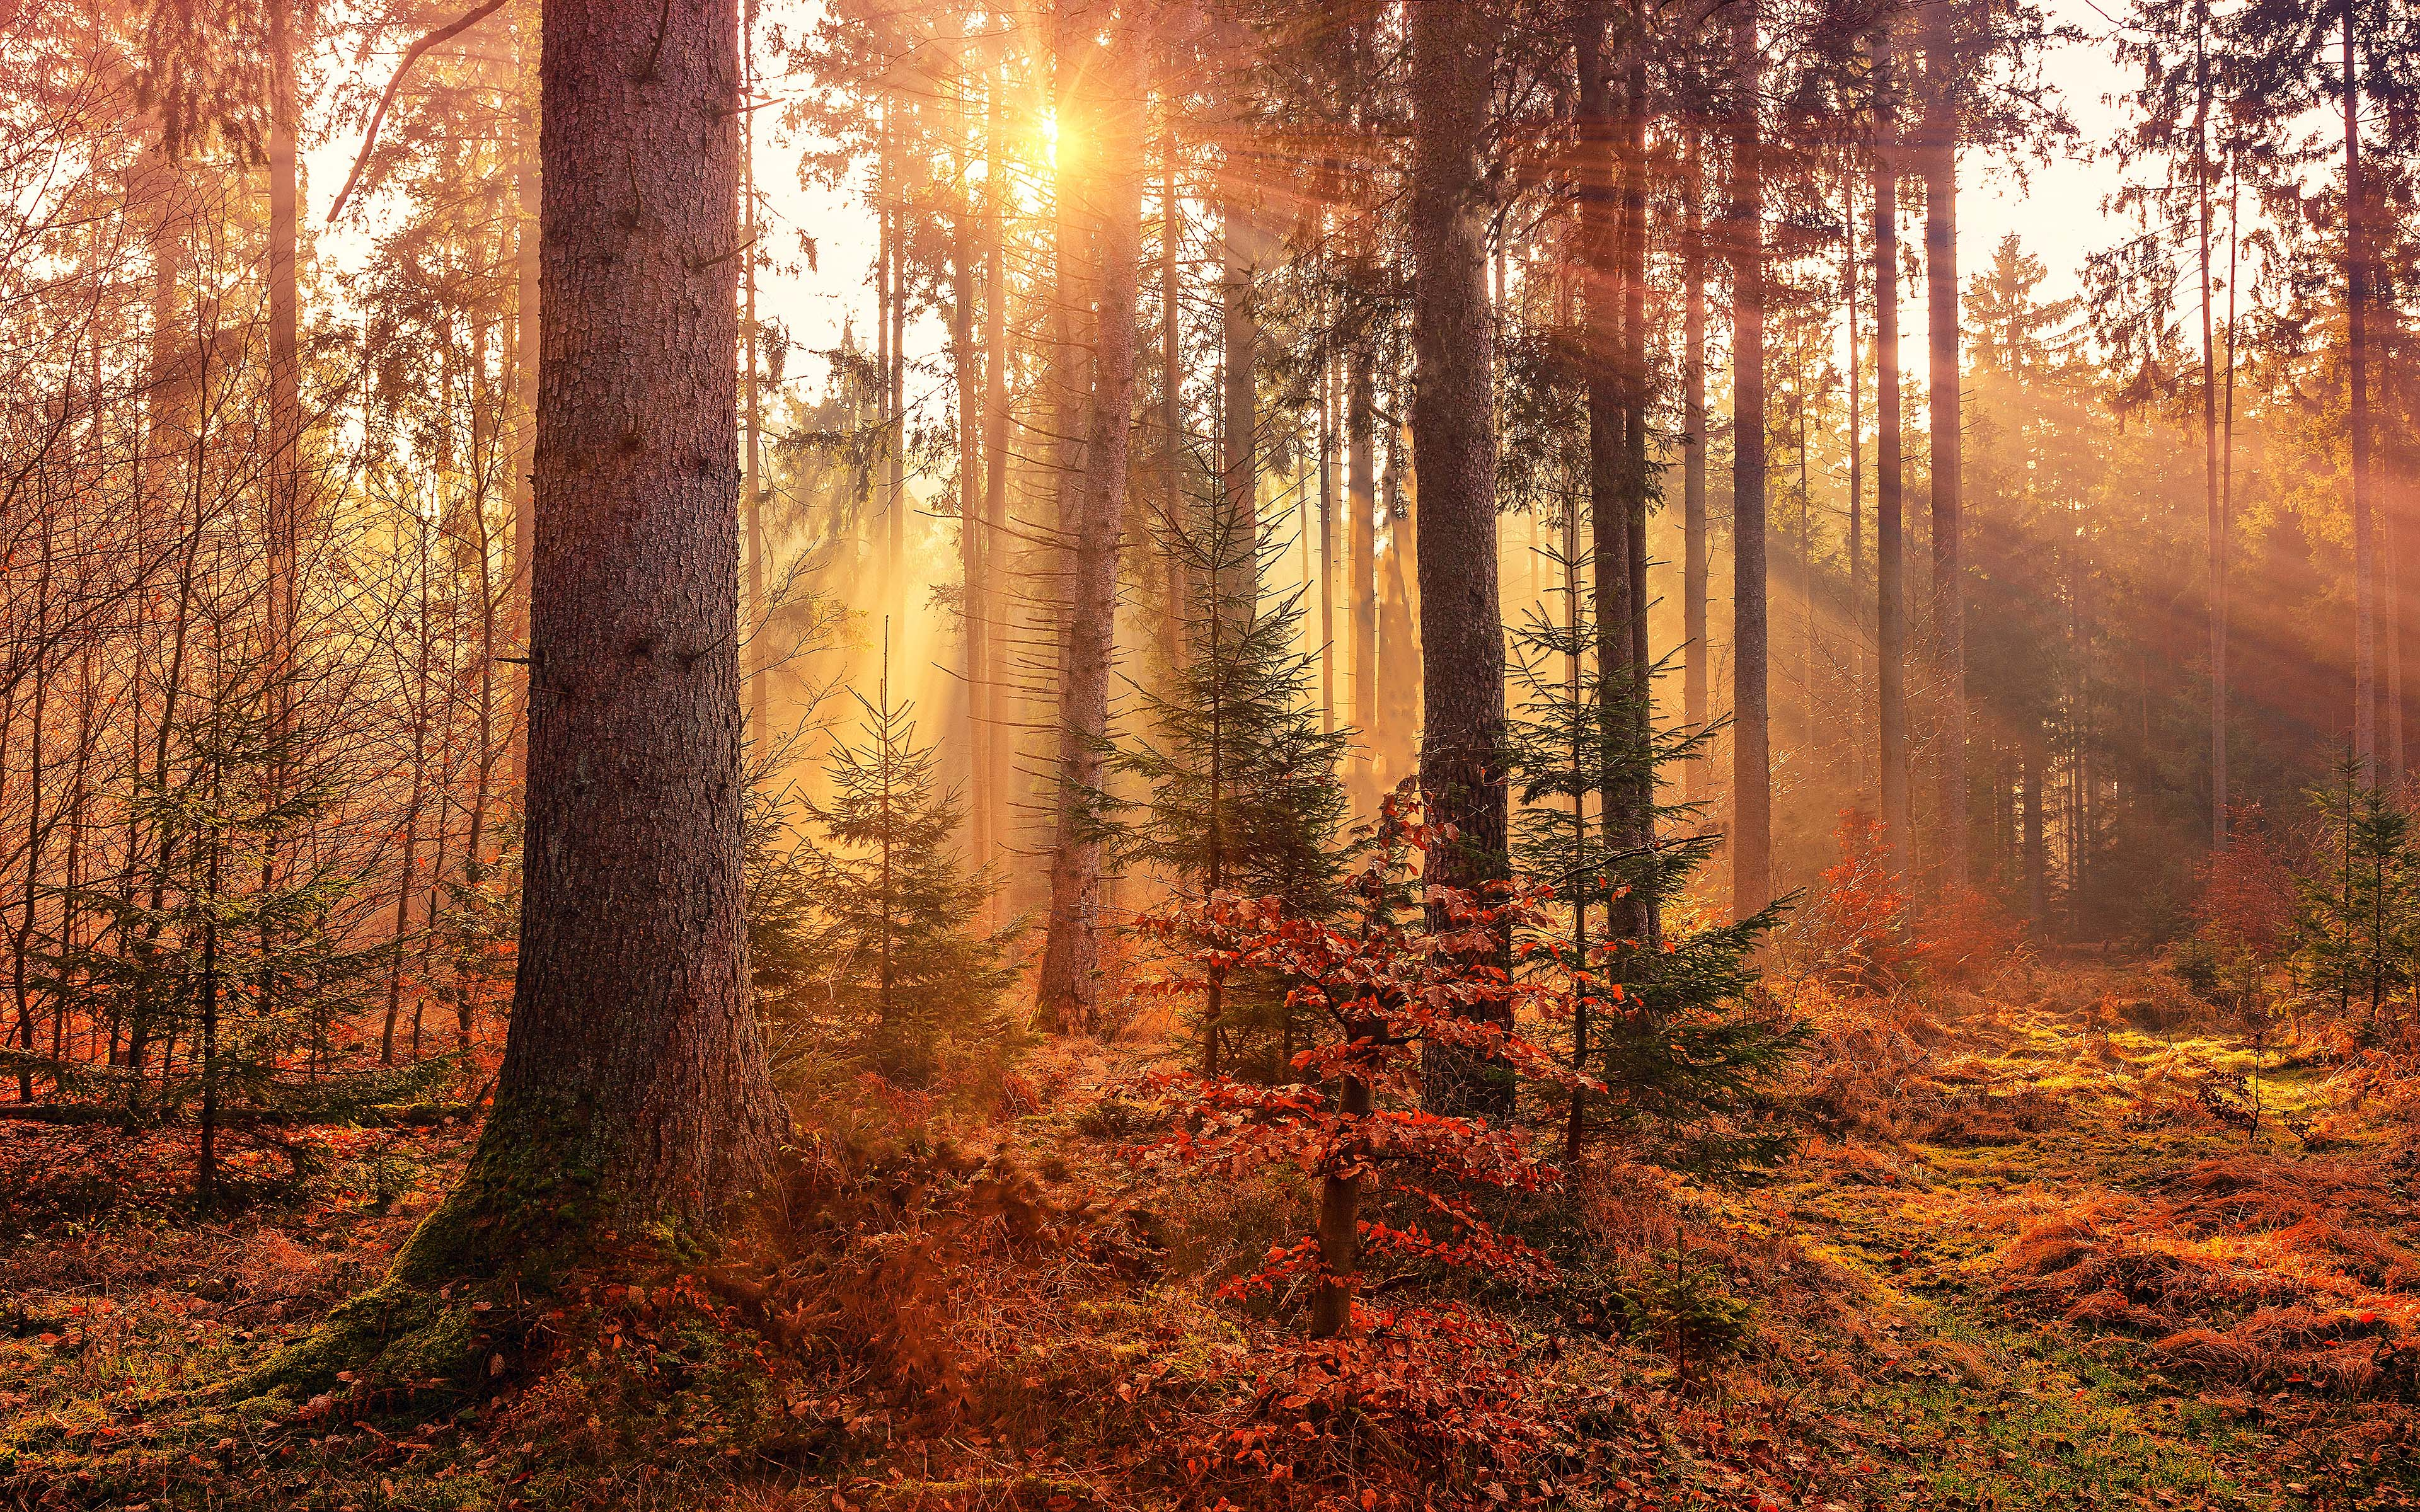 осень, природа, лес, 4k ultra hd обои